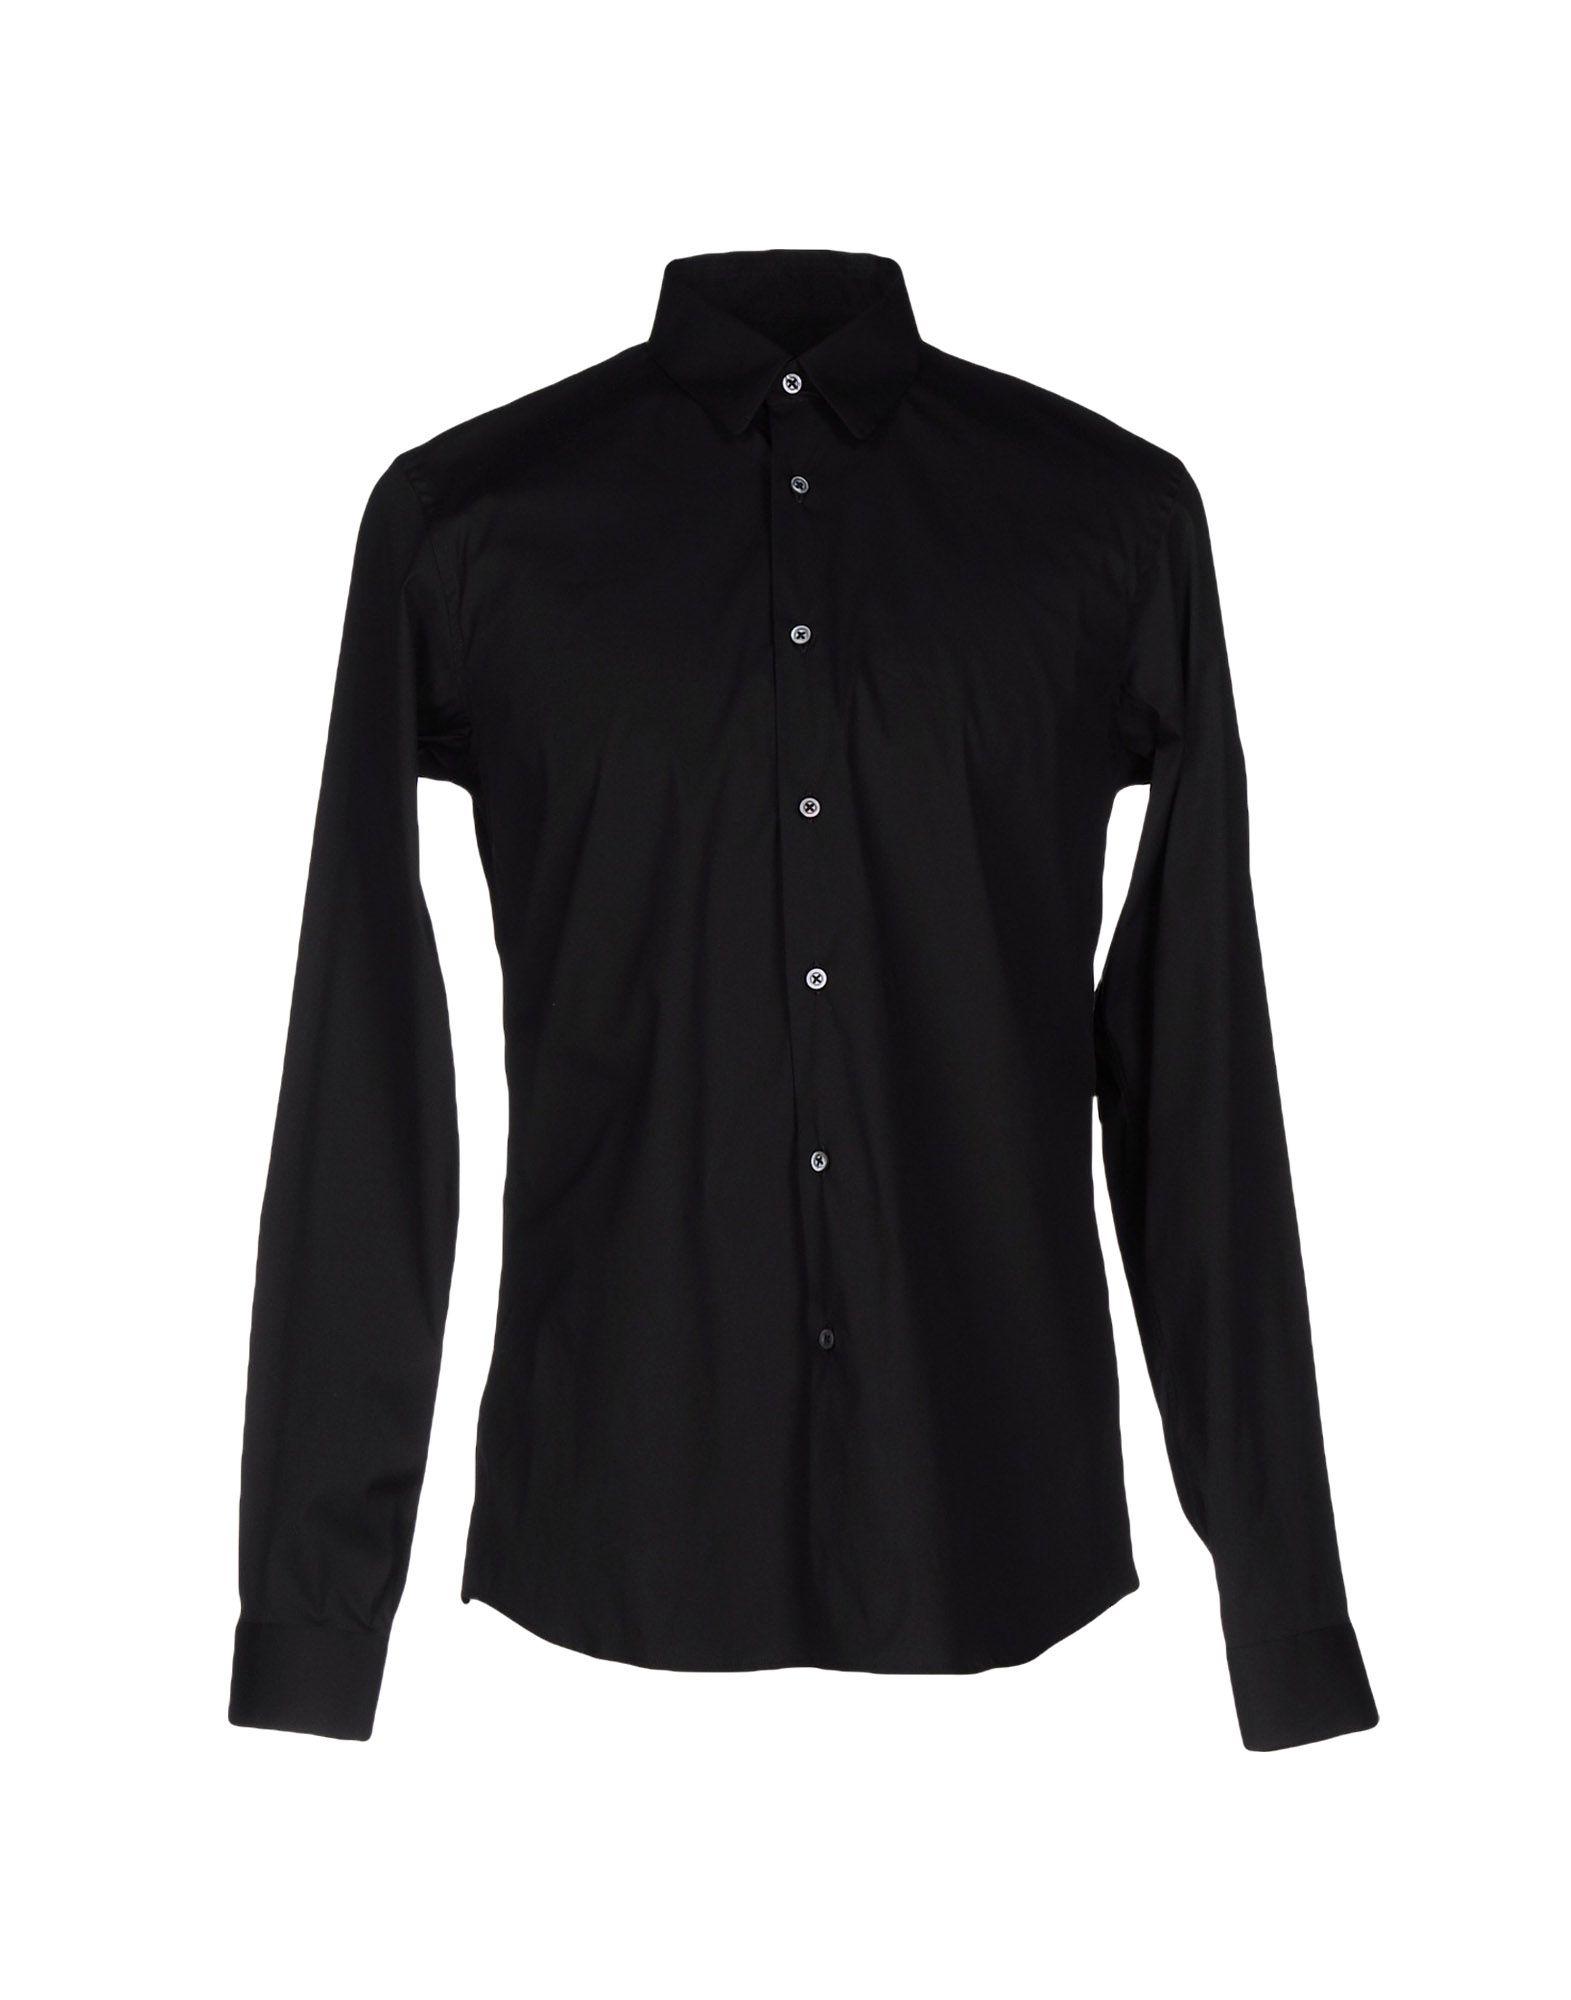 Jil sander shirt in black for men lyst for Jil sander mens shirt